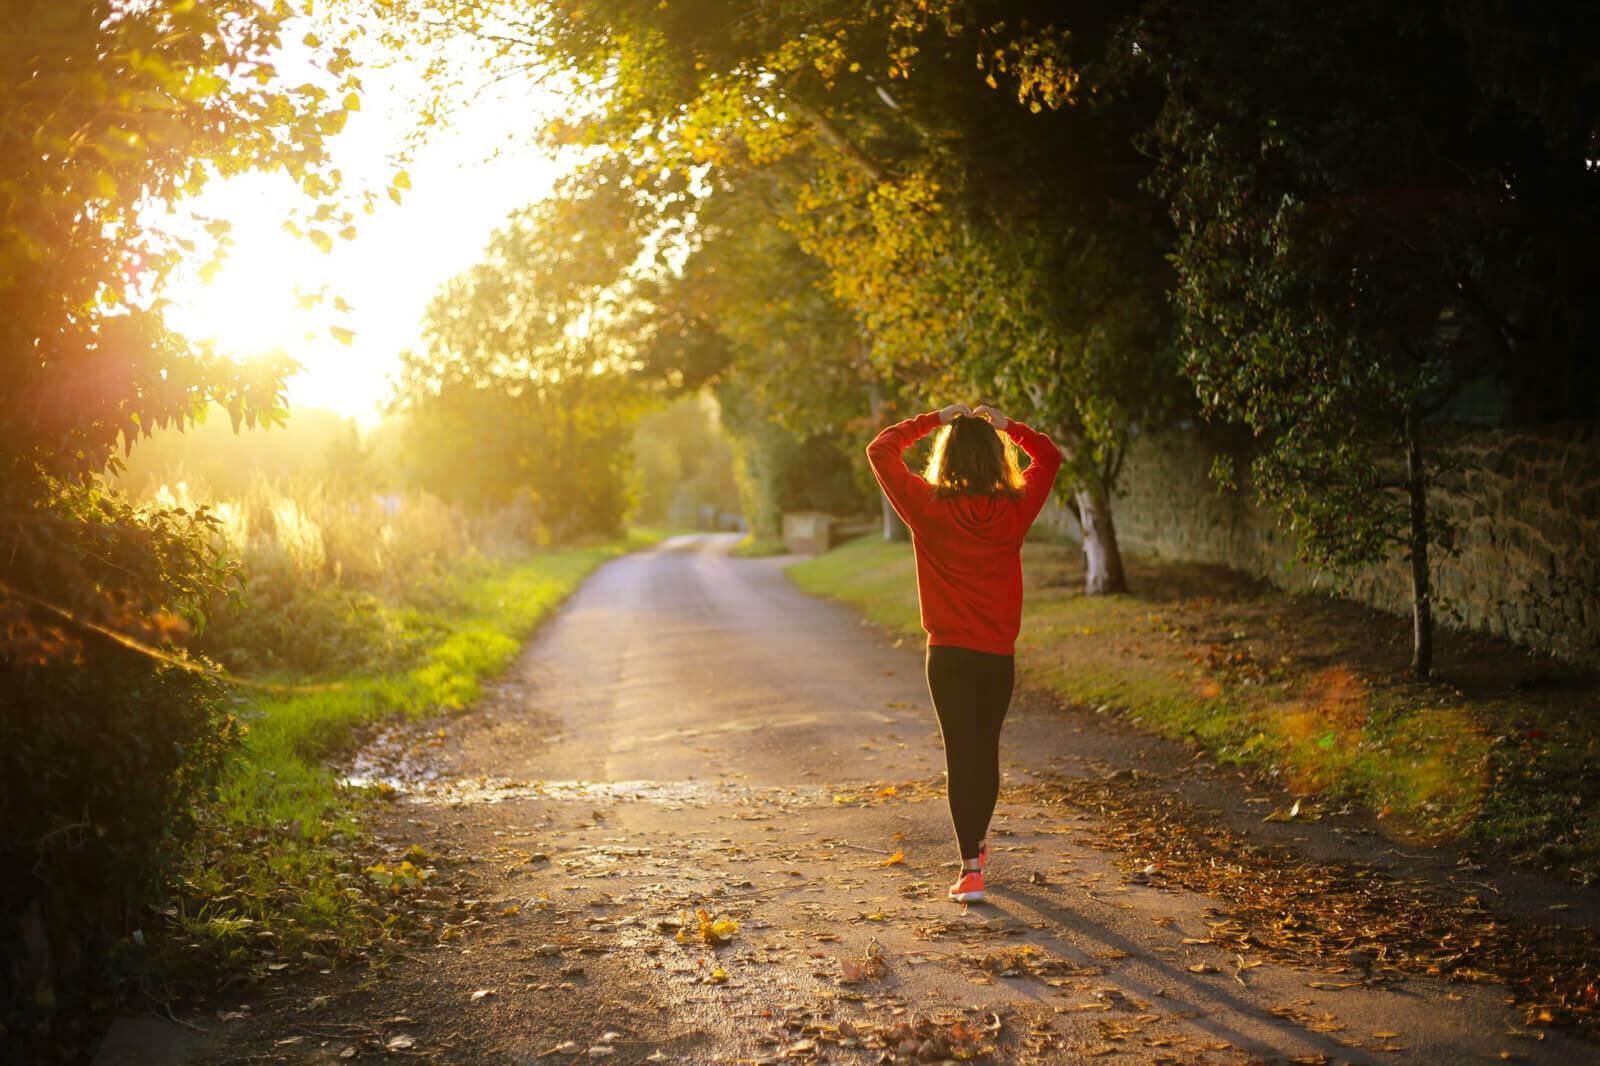 Lady walking along country road at sunrise